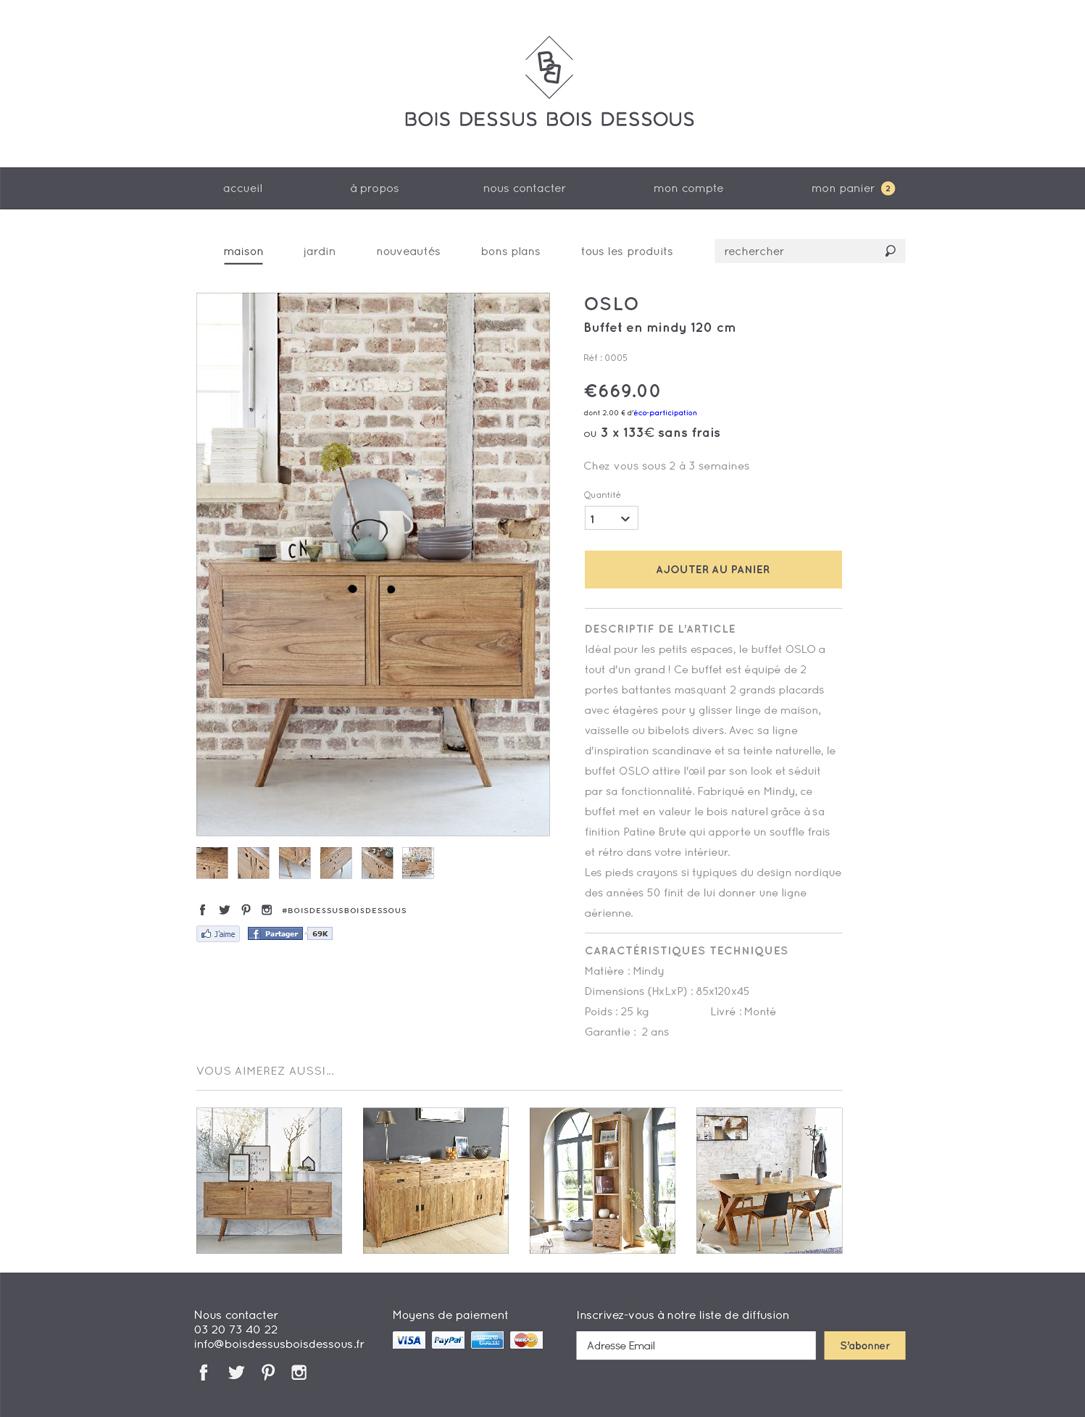 BOIS DESSUS BOIS DESSOUS - Webdesign